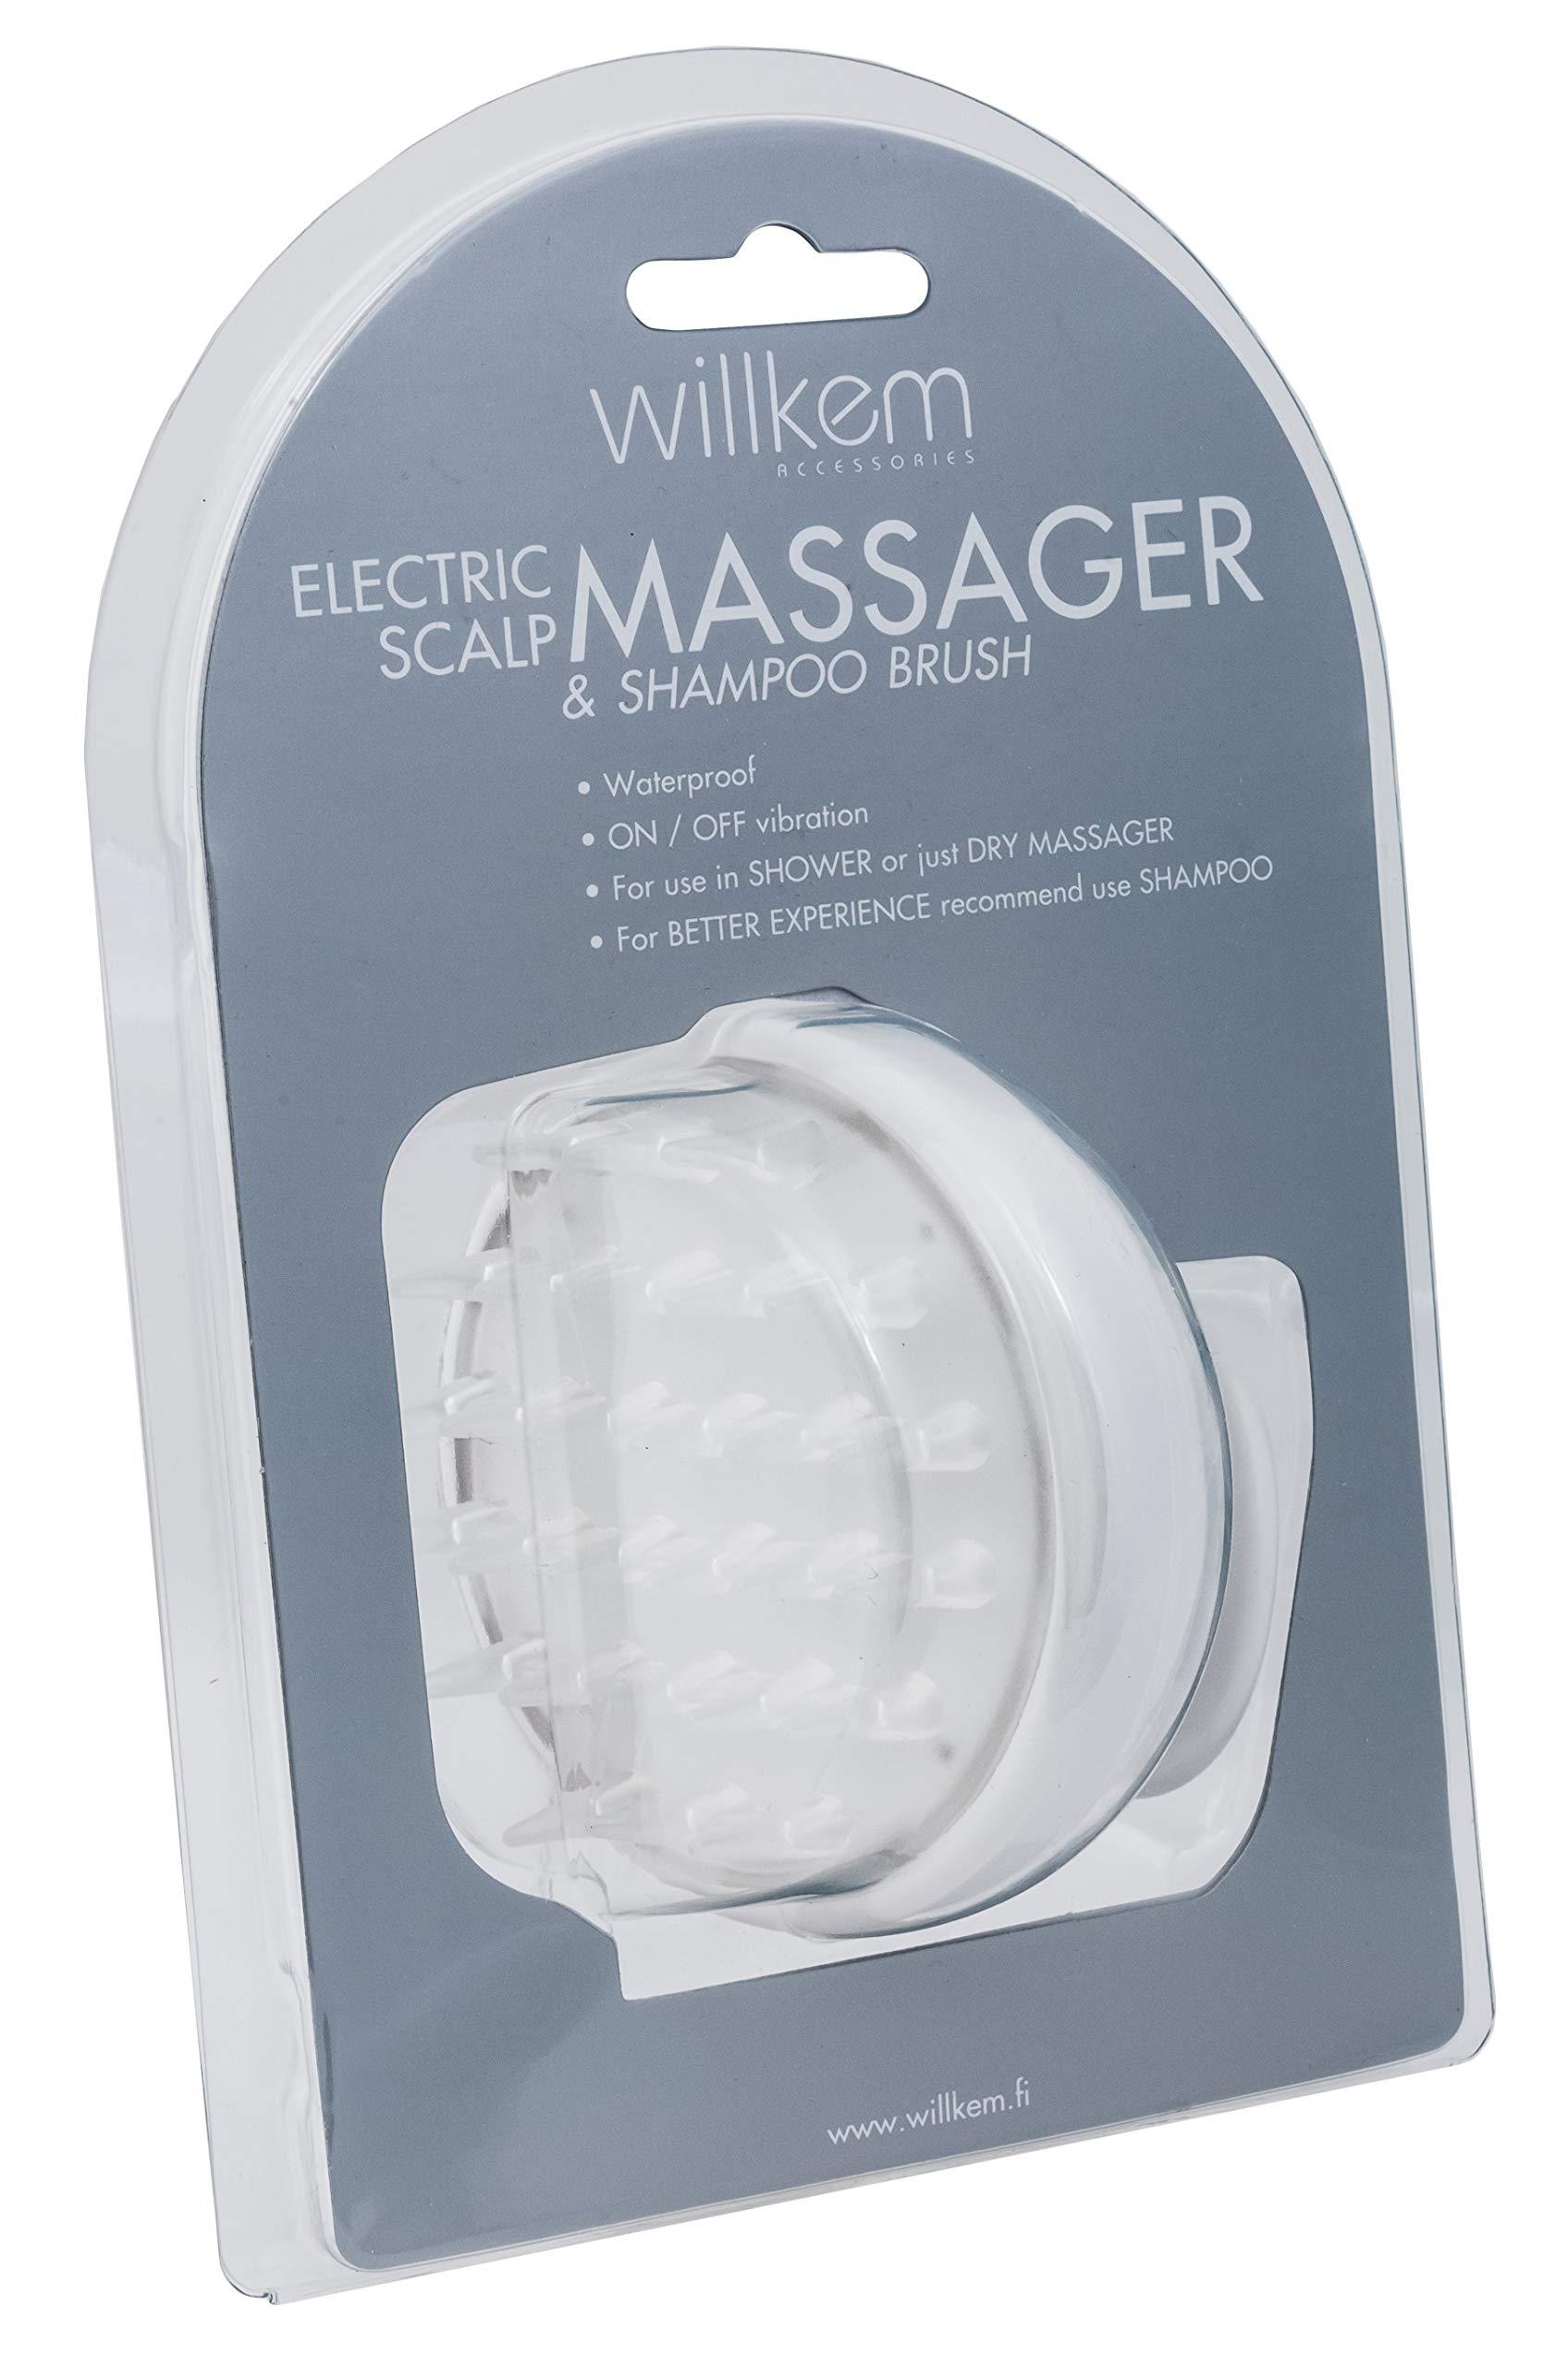 null - Shampoo Brush Vibrating Scalp Massager - Electric Handheld Soft Hair Scrubber